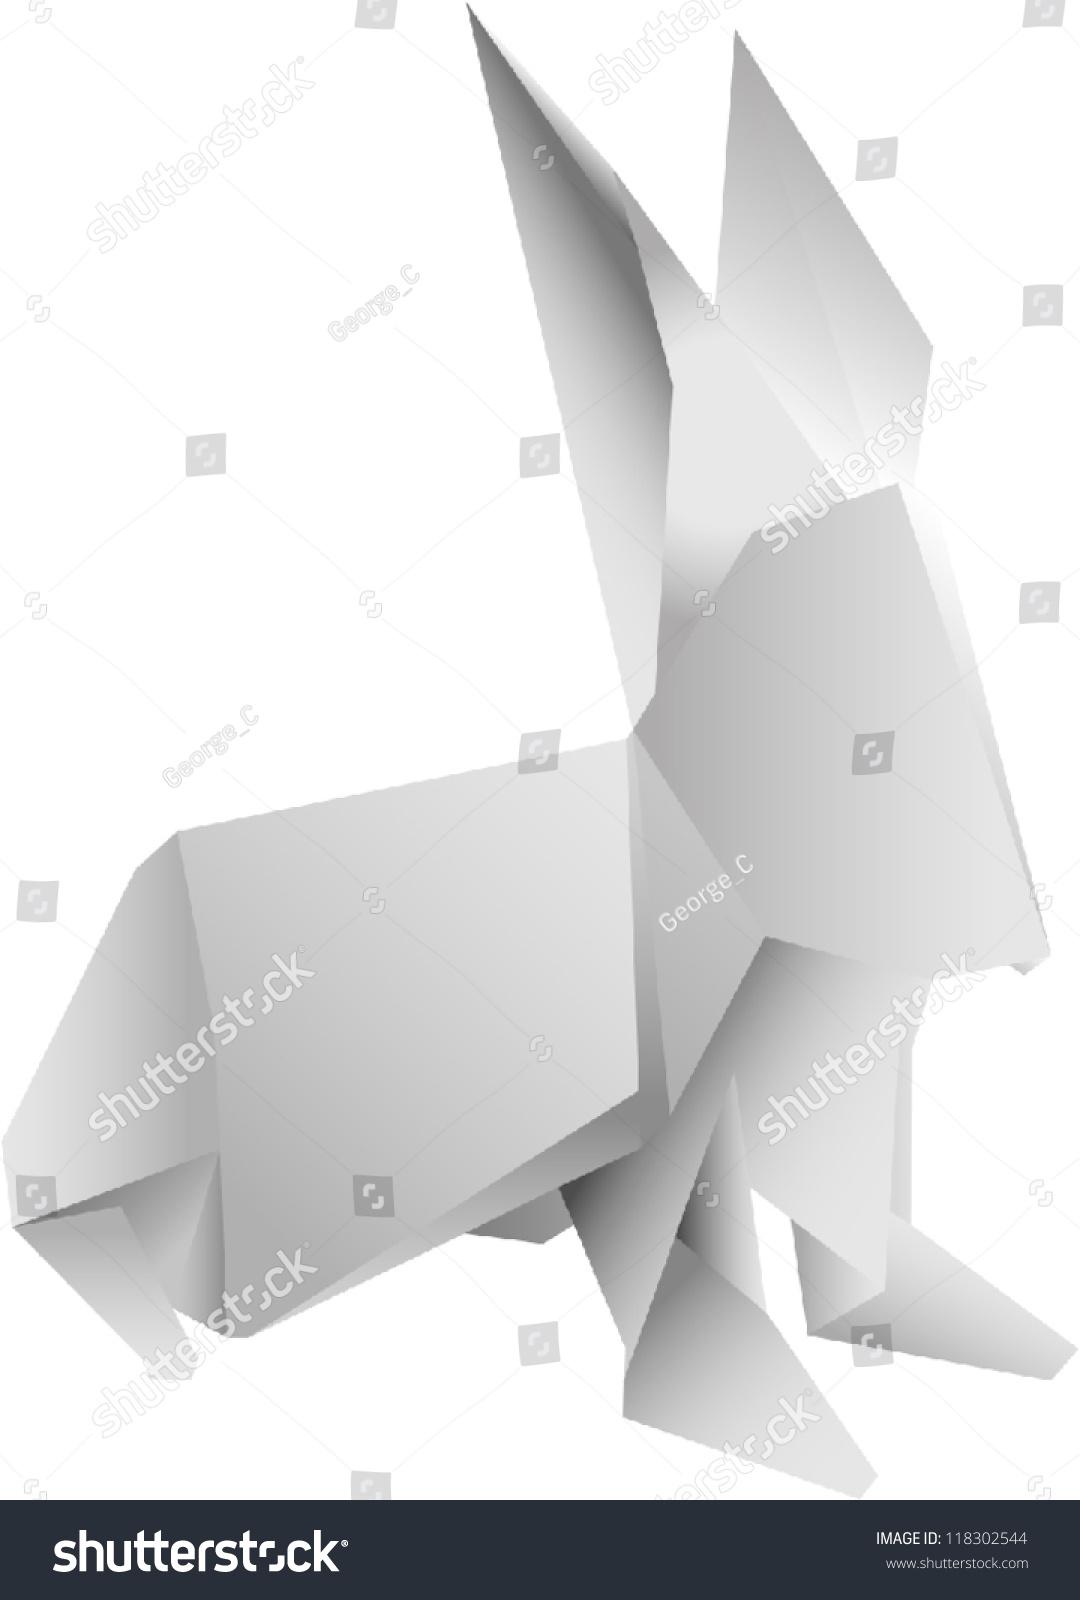 Origami Rabbit Vector Stock Vector HD Royalty Free 118302544